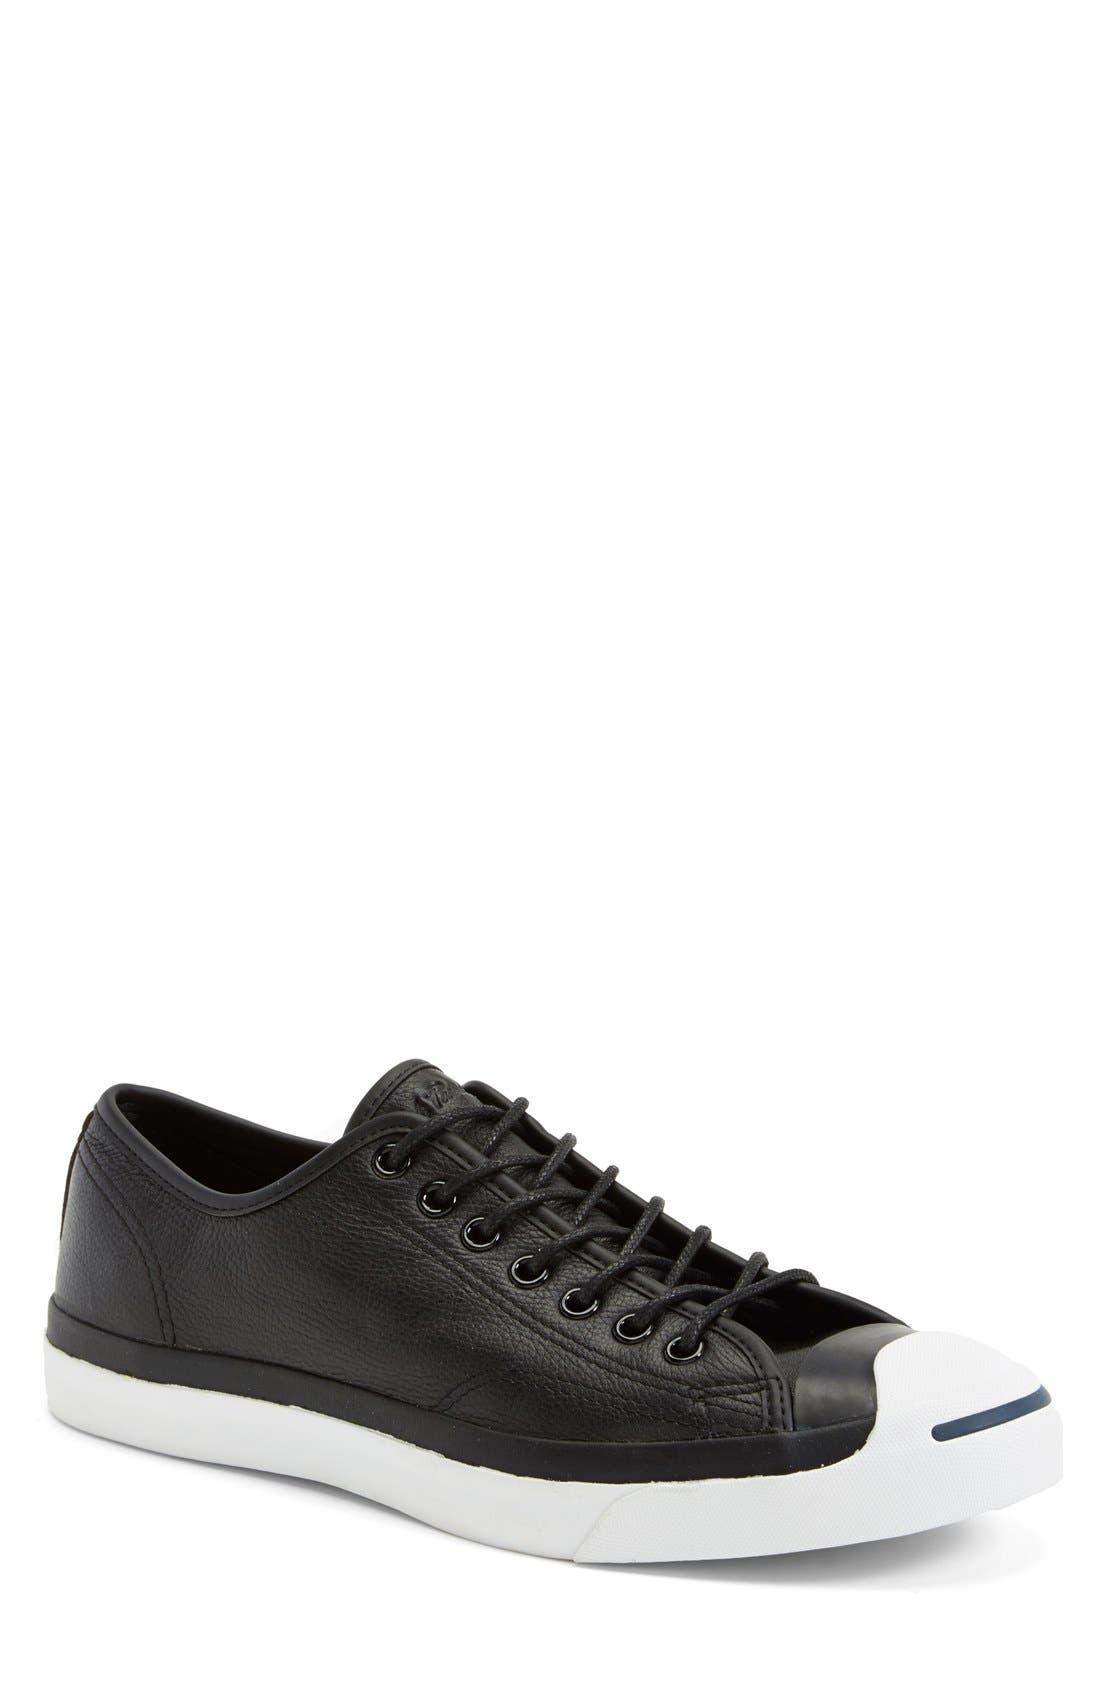 Main Image - Converse 'Jack Purcell - Jack' Sneaker (Men)